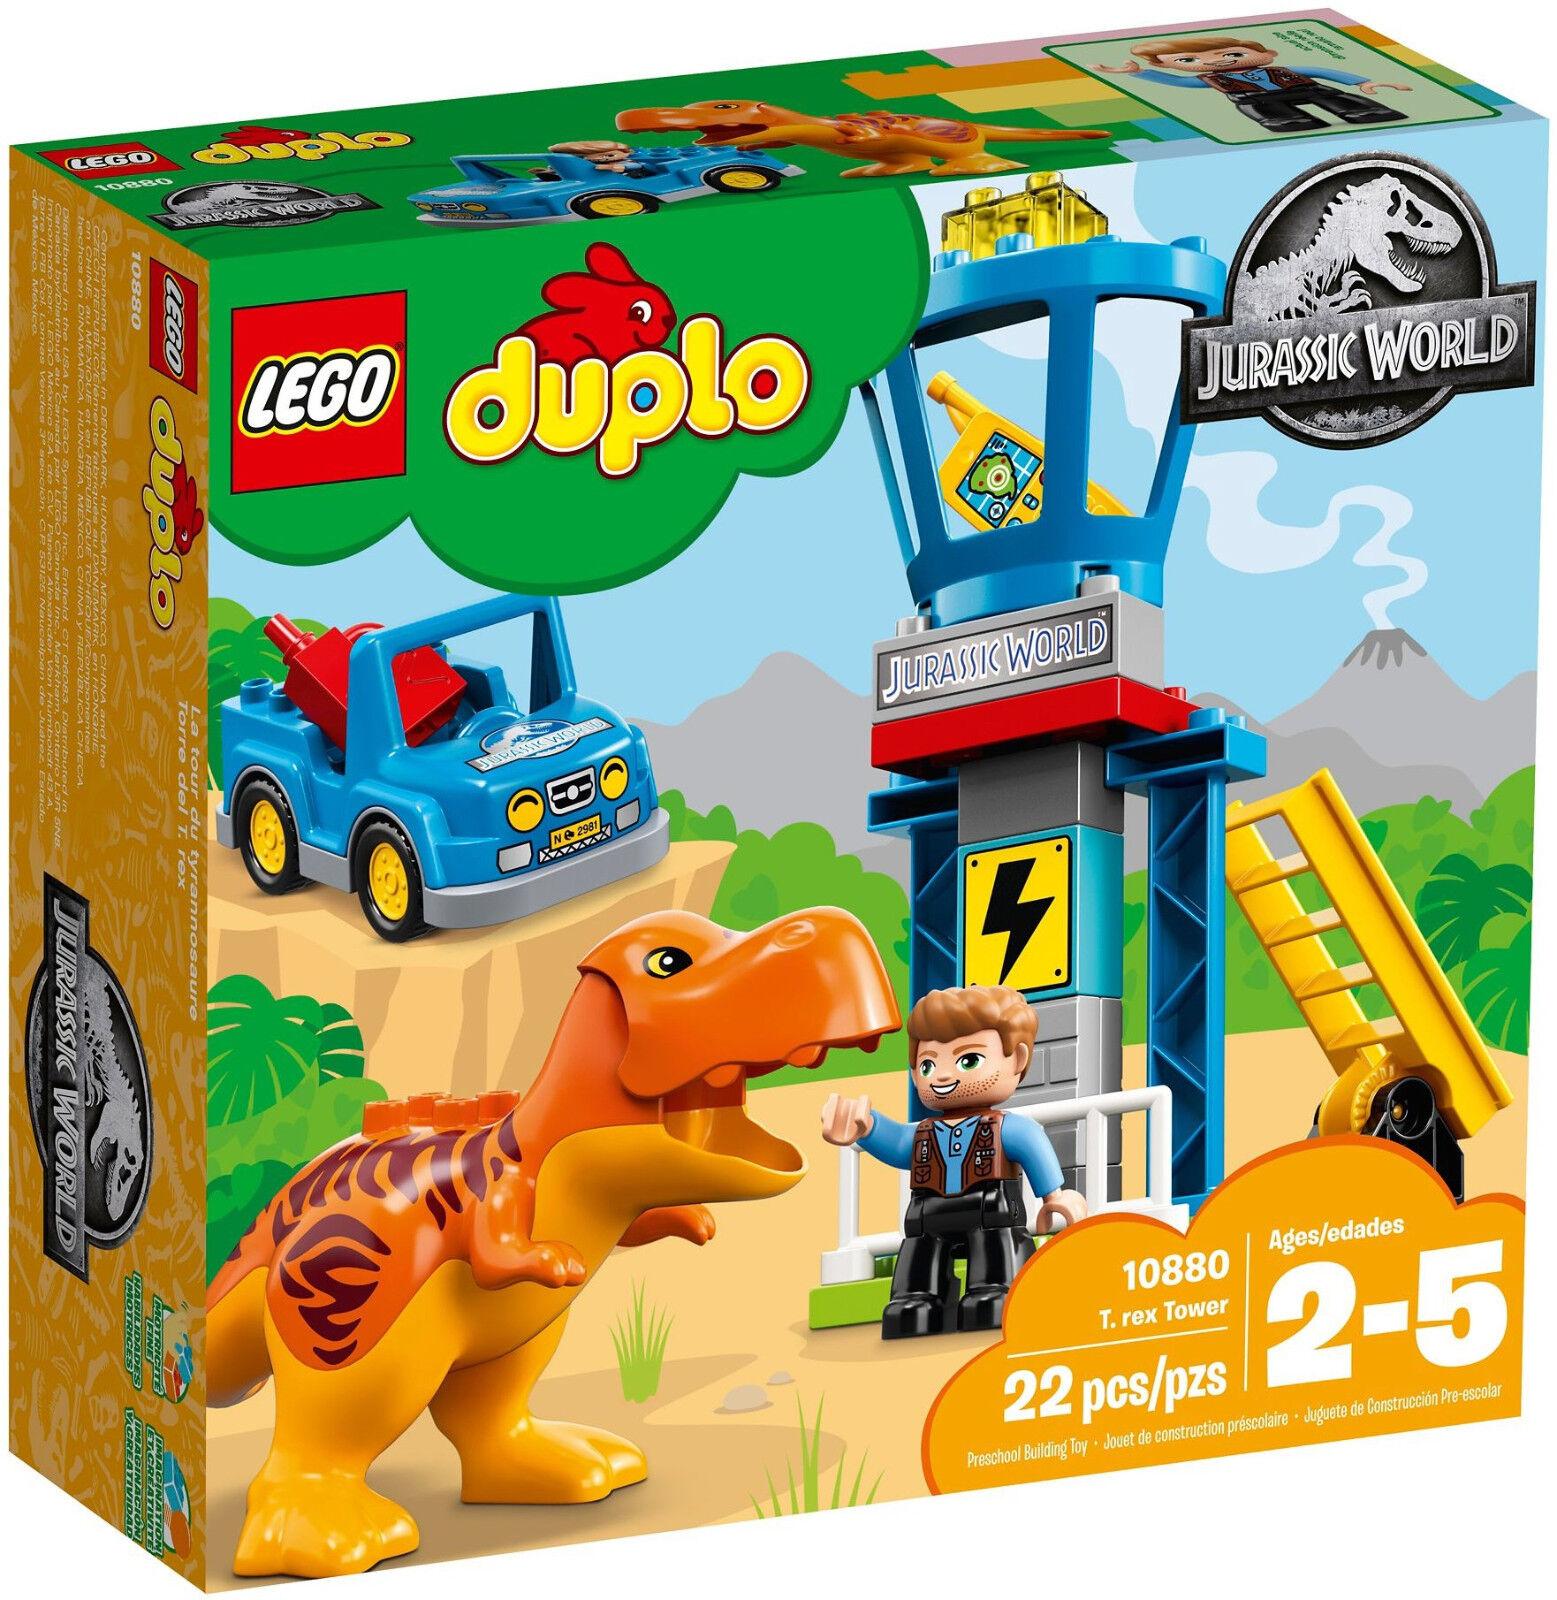 LEGO Duplo - 10880 T-Rex Aussichtsplattform / T-Rex Tower - Neu & OVP